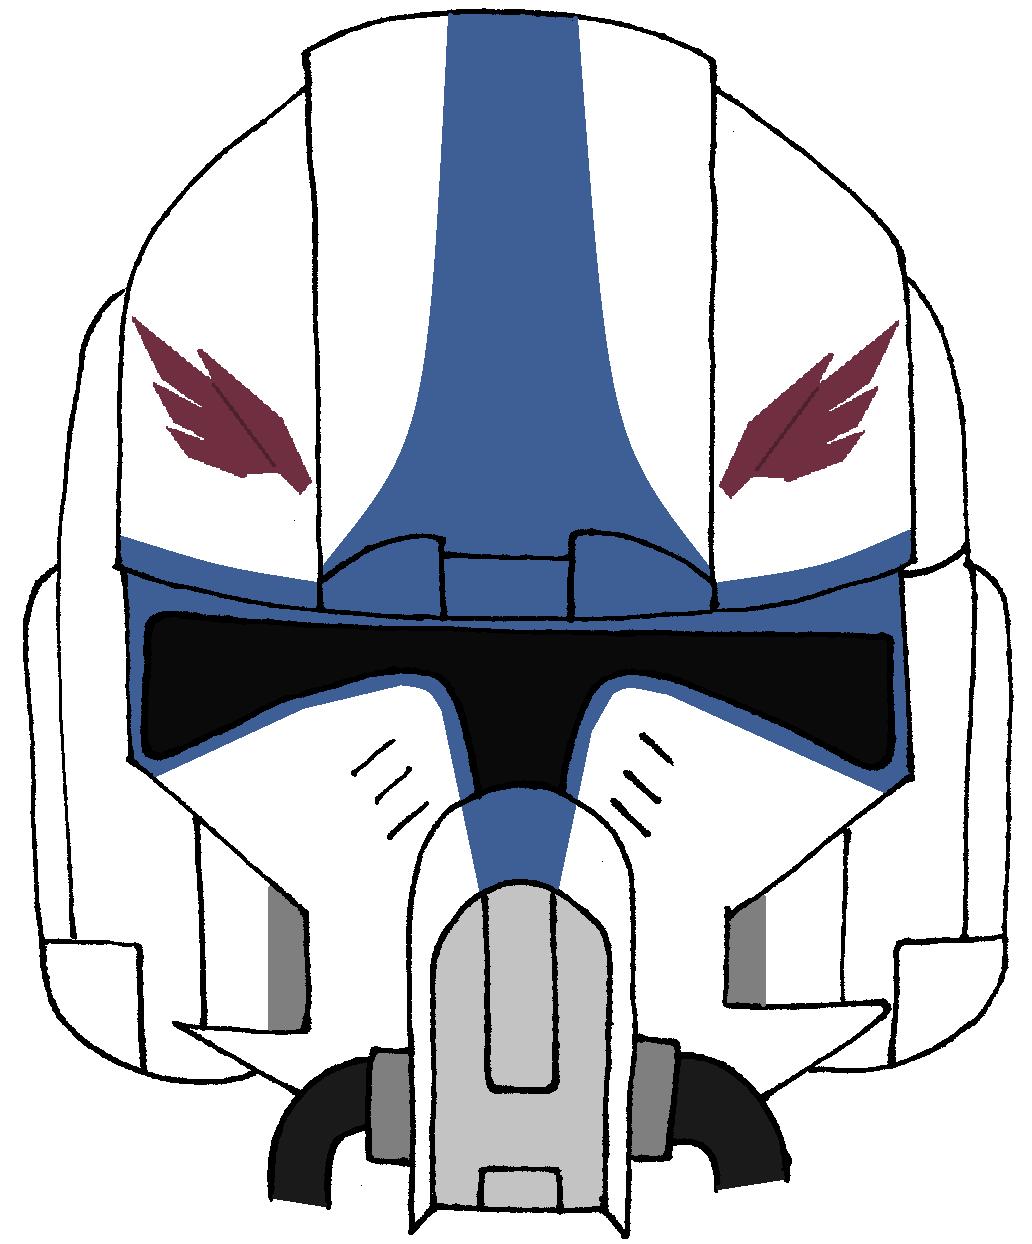 Clone Navy Pilot Hawk S Helmet 2 Star Wars Art Star Wars Images Star Wars Collection